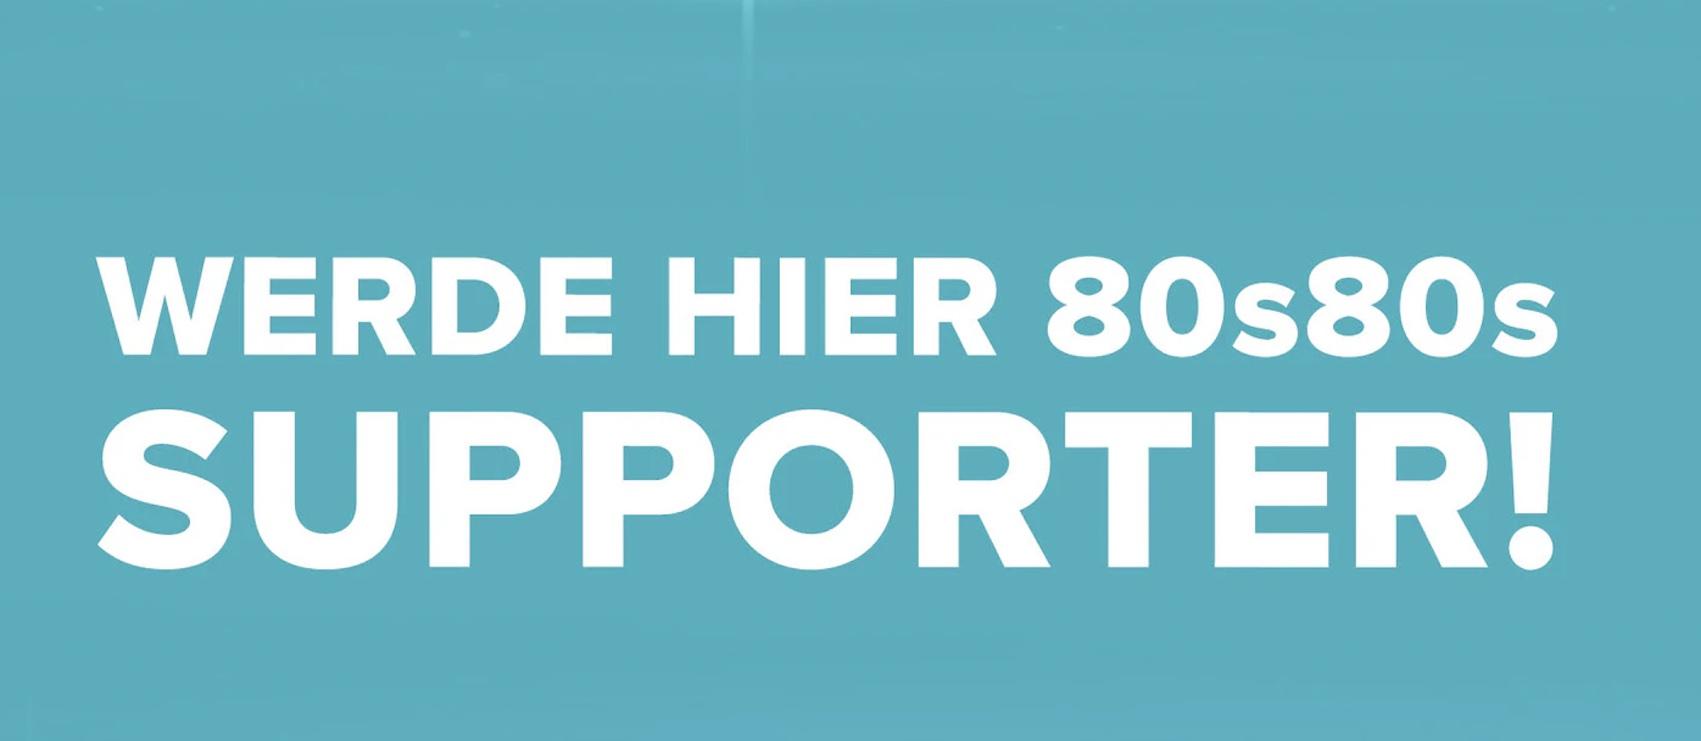 80s80s sucht Supporter (Quelle: 80s80s.de, Screenshot: SmartPhoneFan.de)